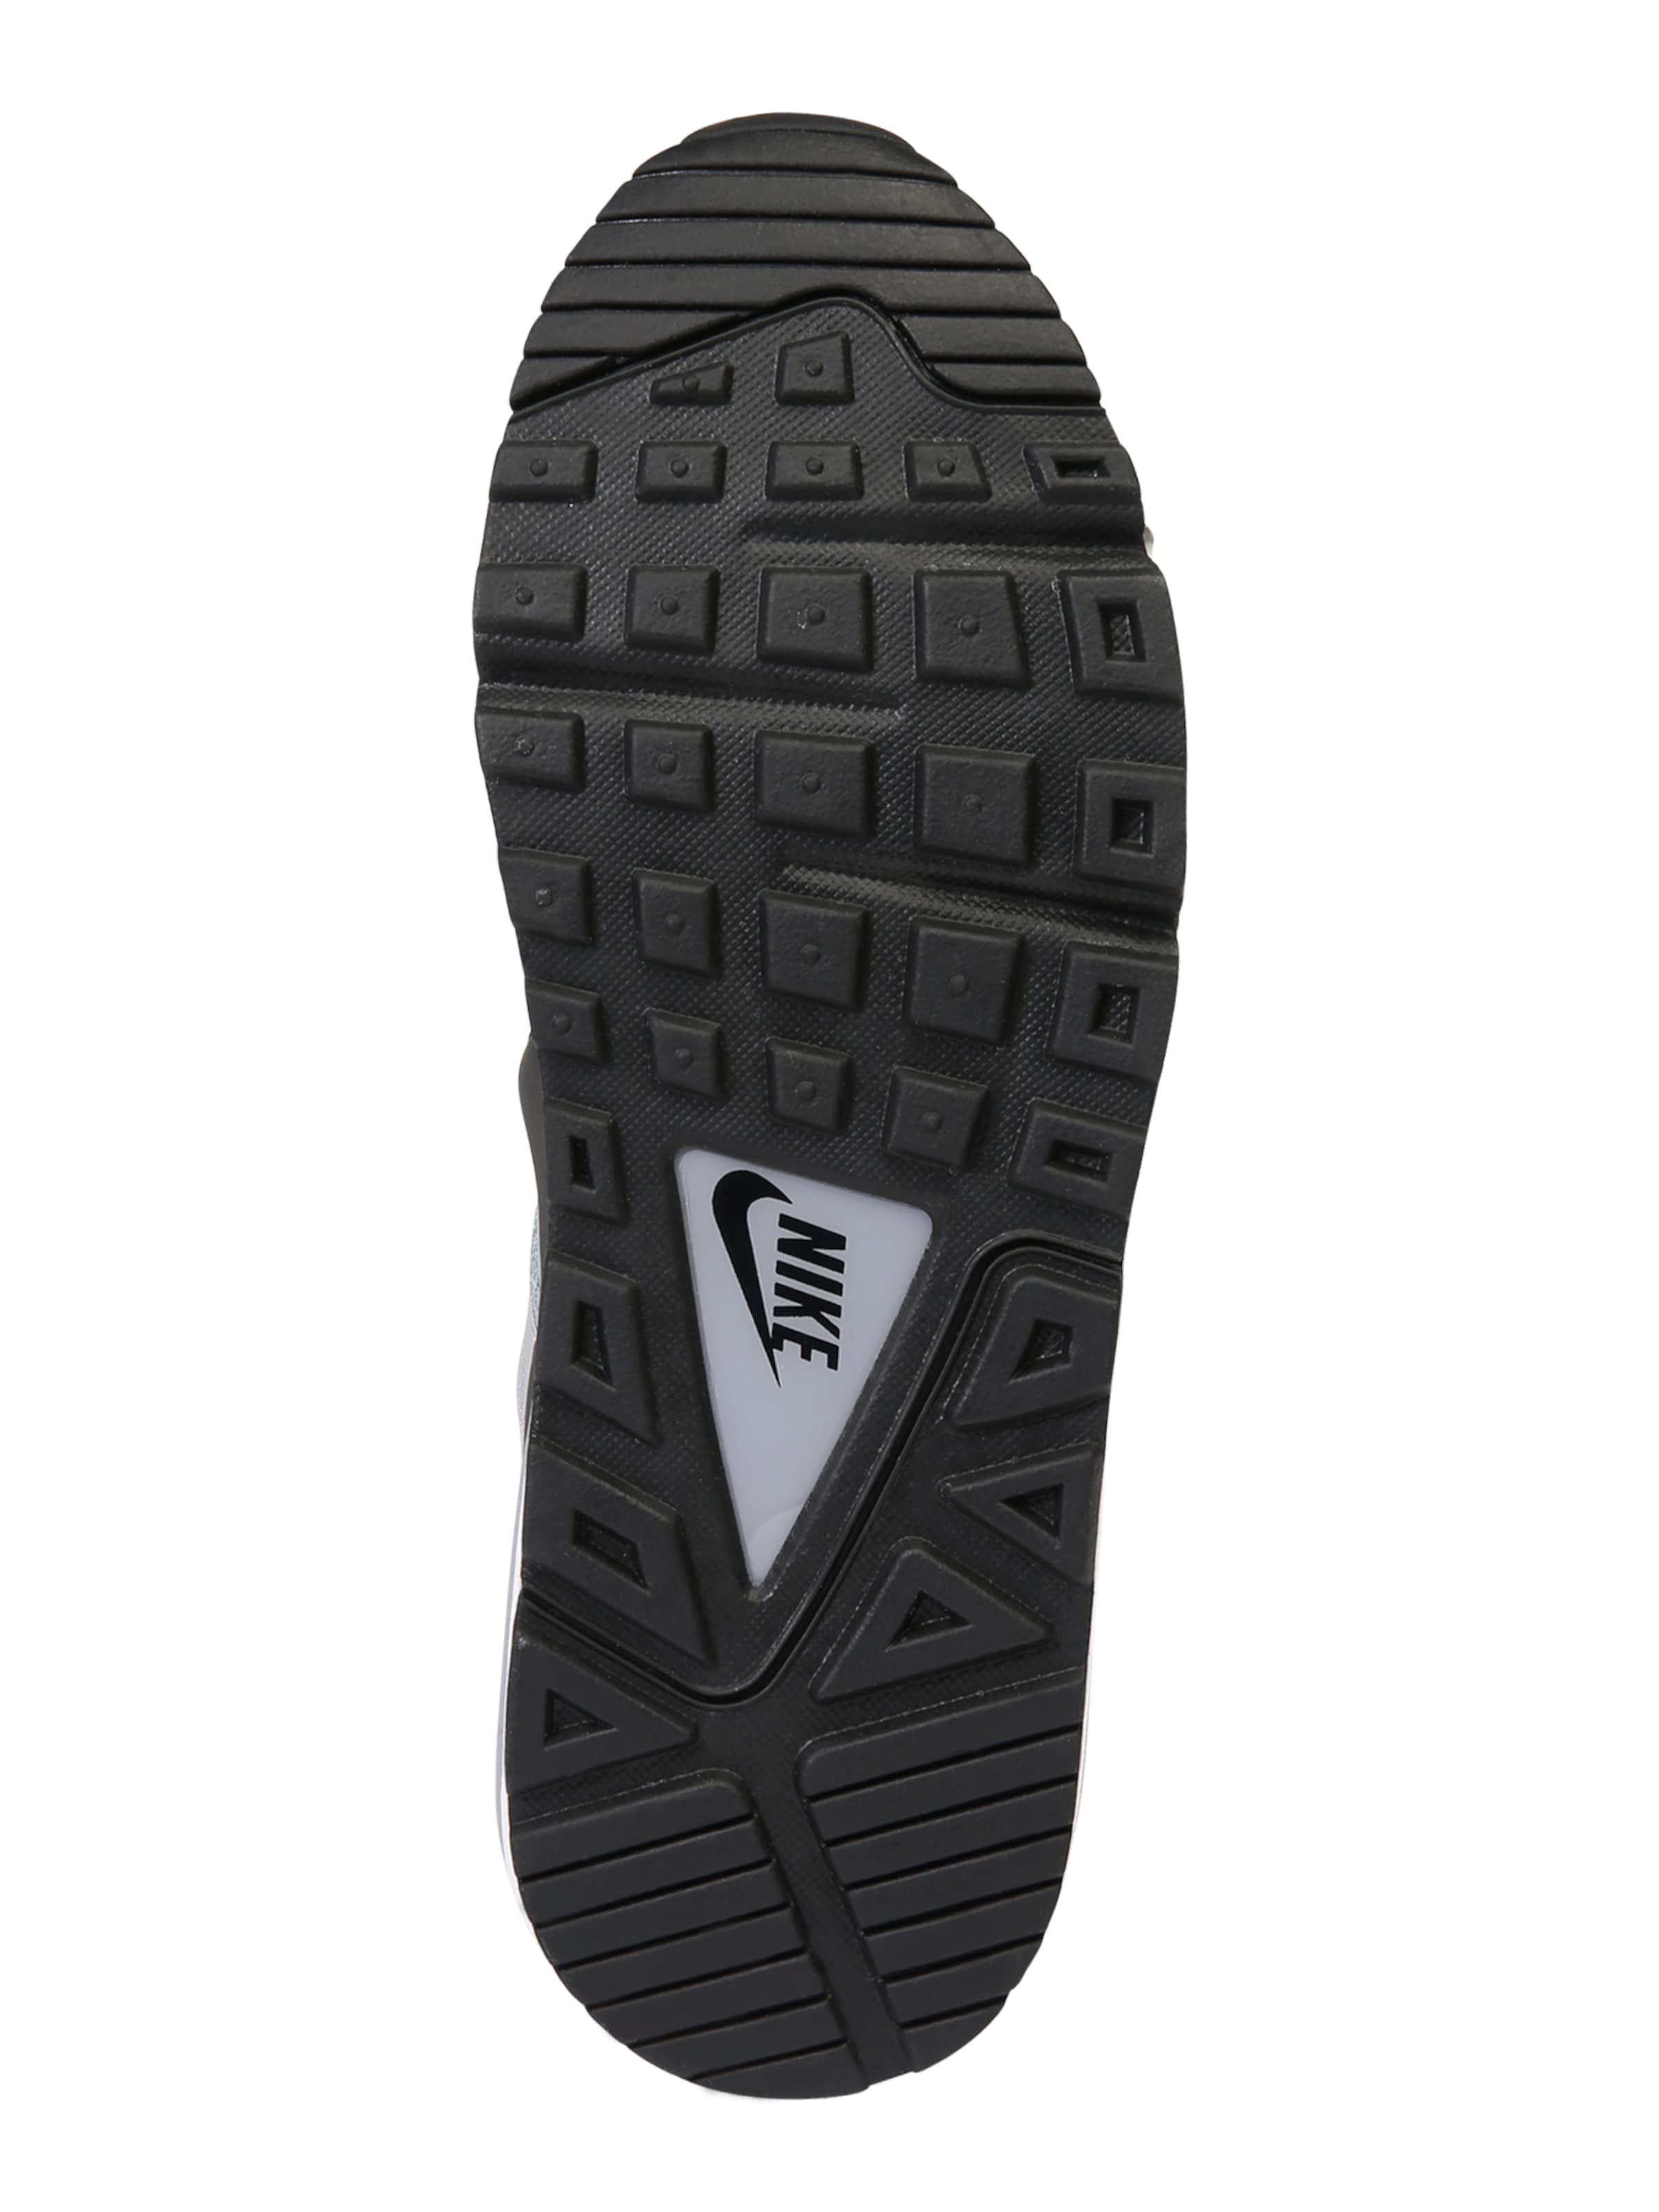 Max In Sportswear Command' 'air Nike HellgrauDunkelgrau Sneaker 6gIbf7Yymv